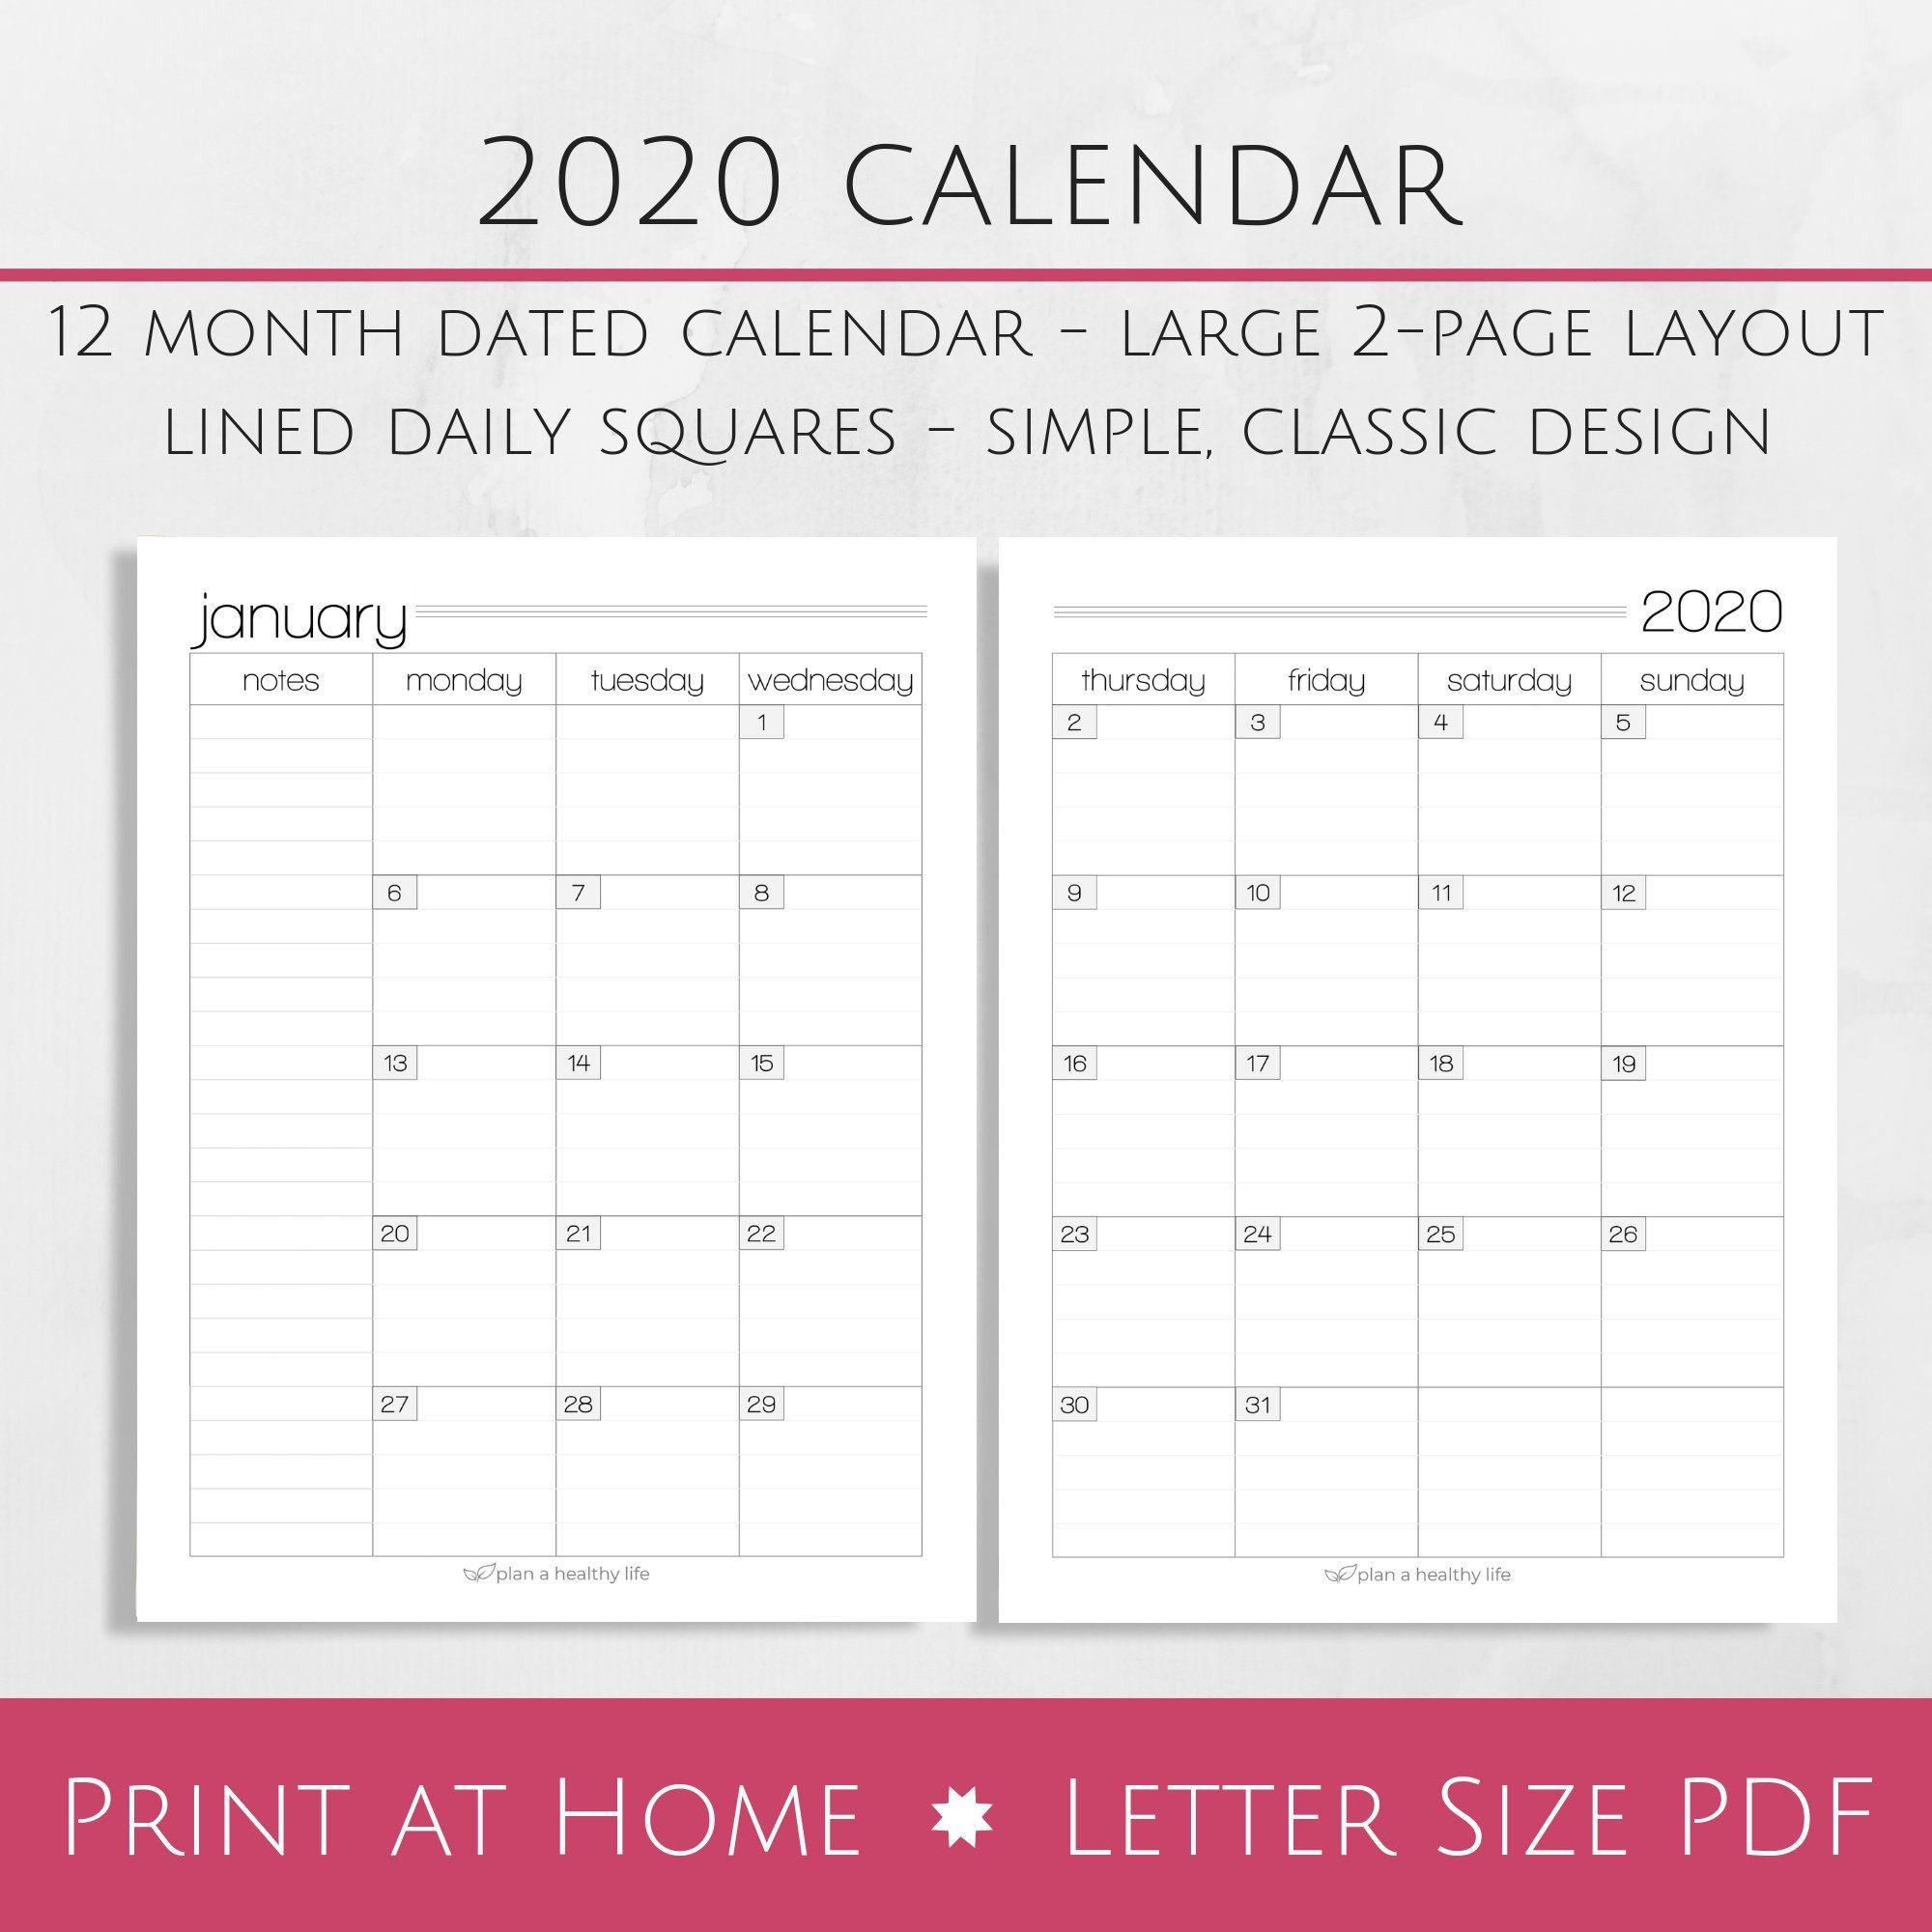 printable 2020 monthly calendar 8 5x11 letter size pdf 2020 planner insert instant download planner calendar